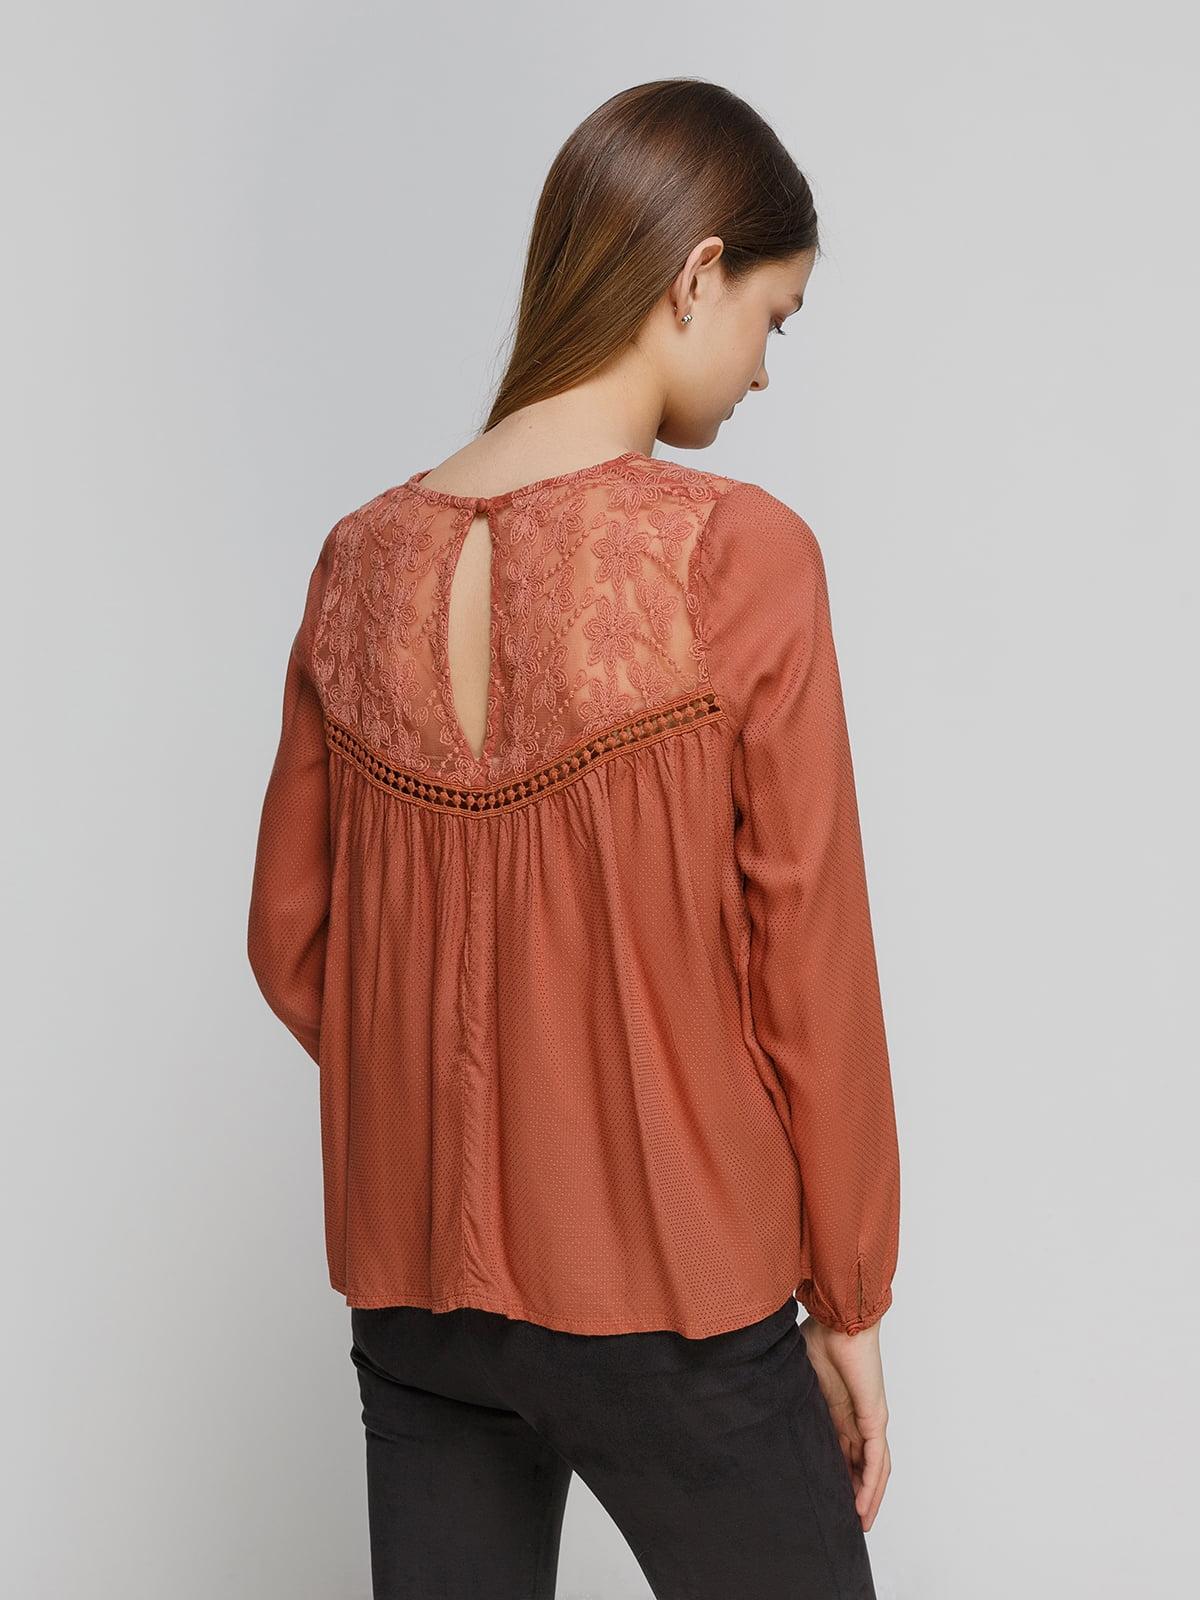 Блуза терракотовая   4628446   фото 2